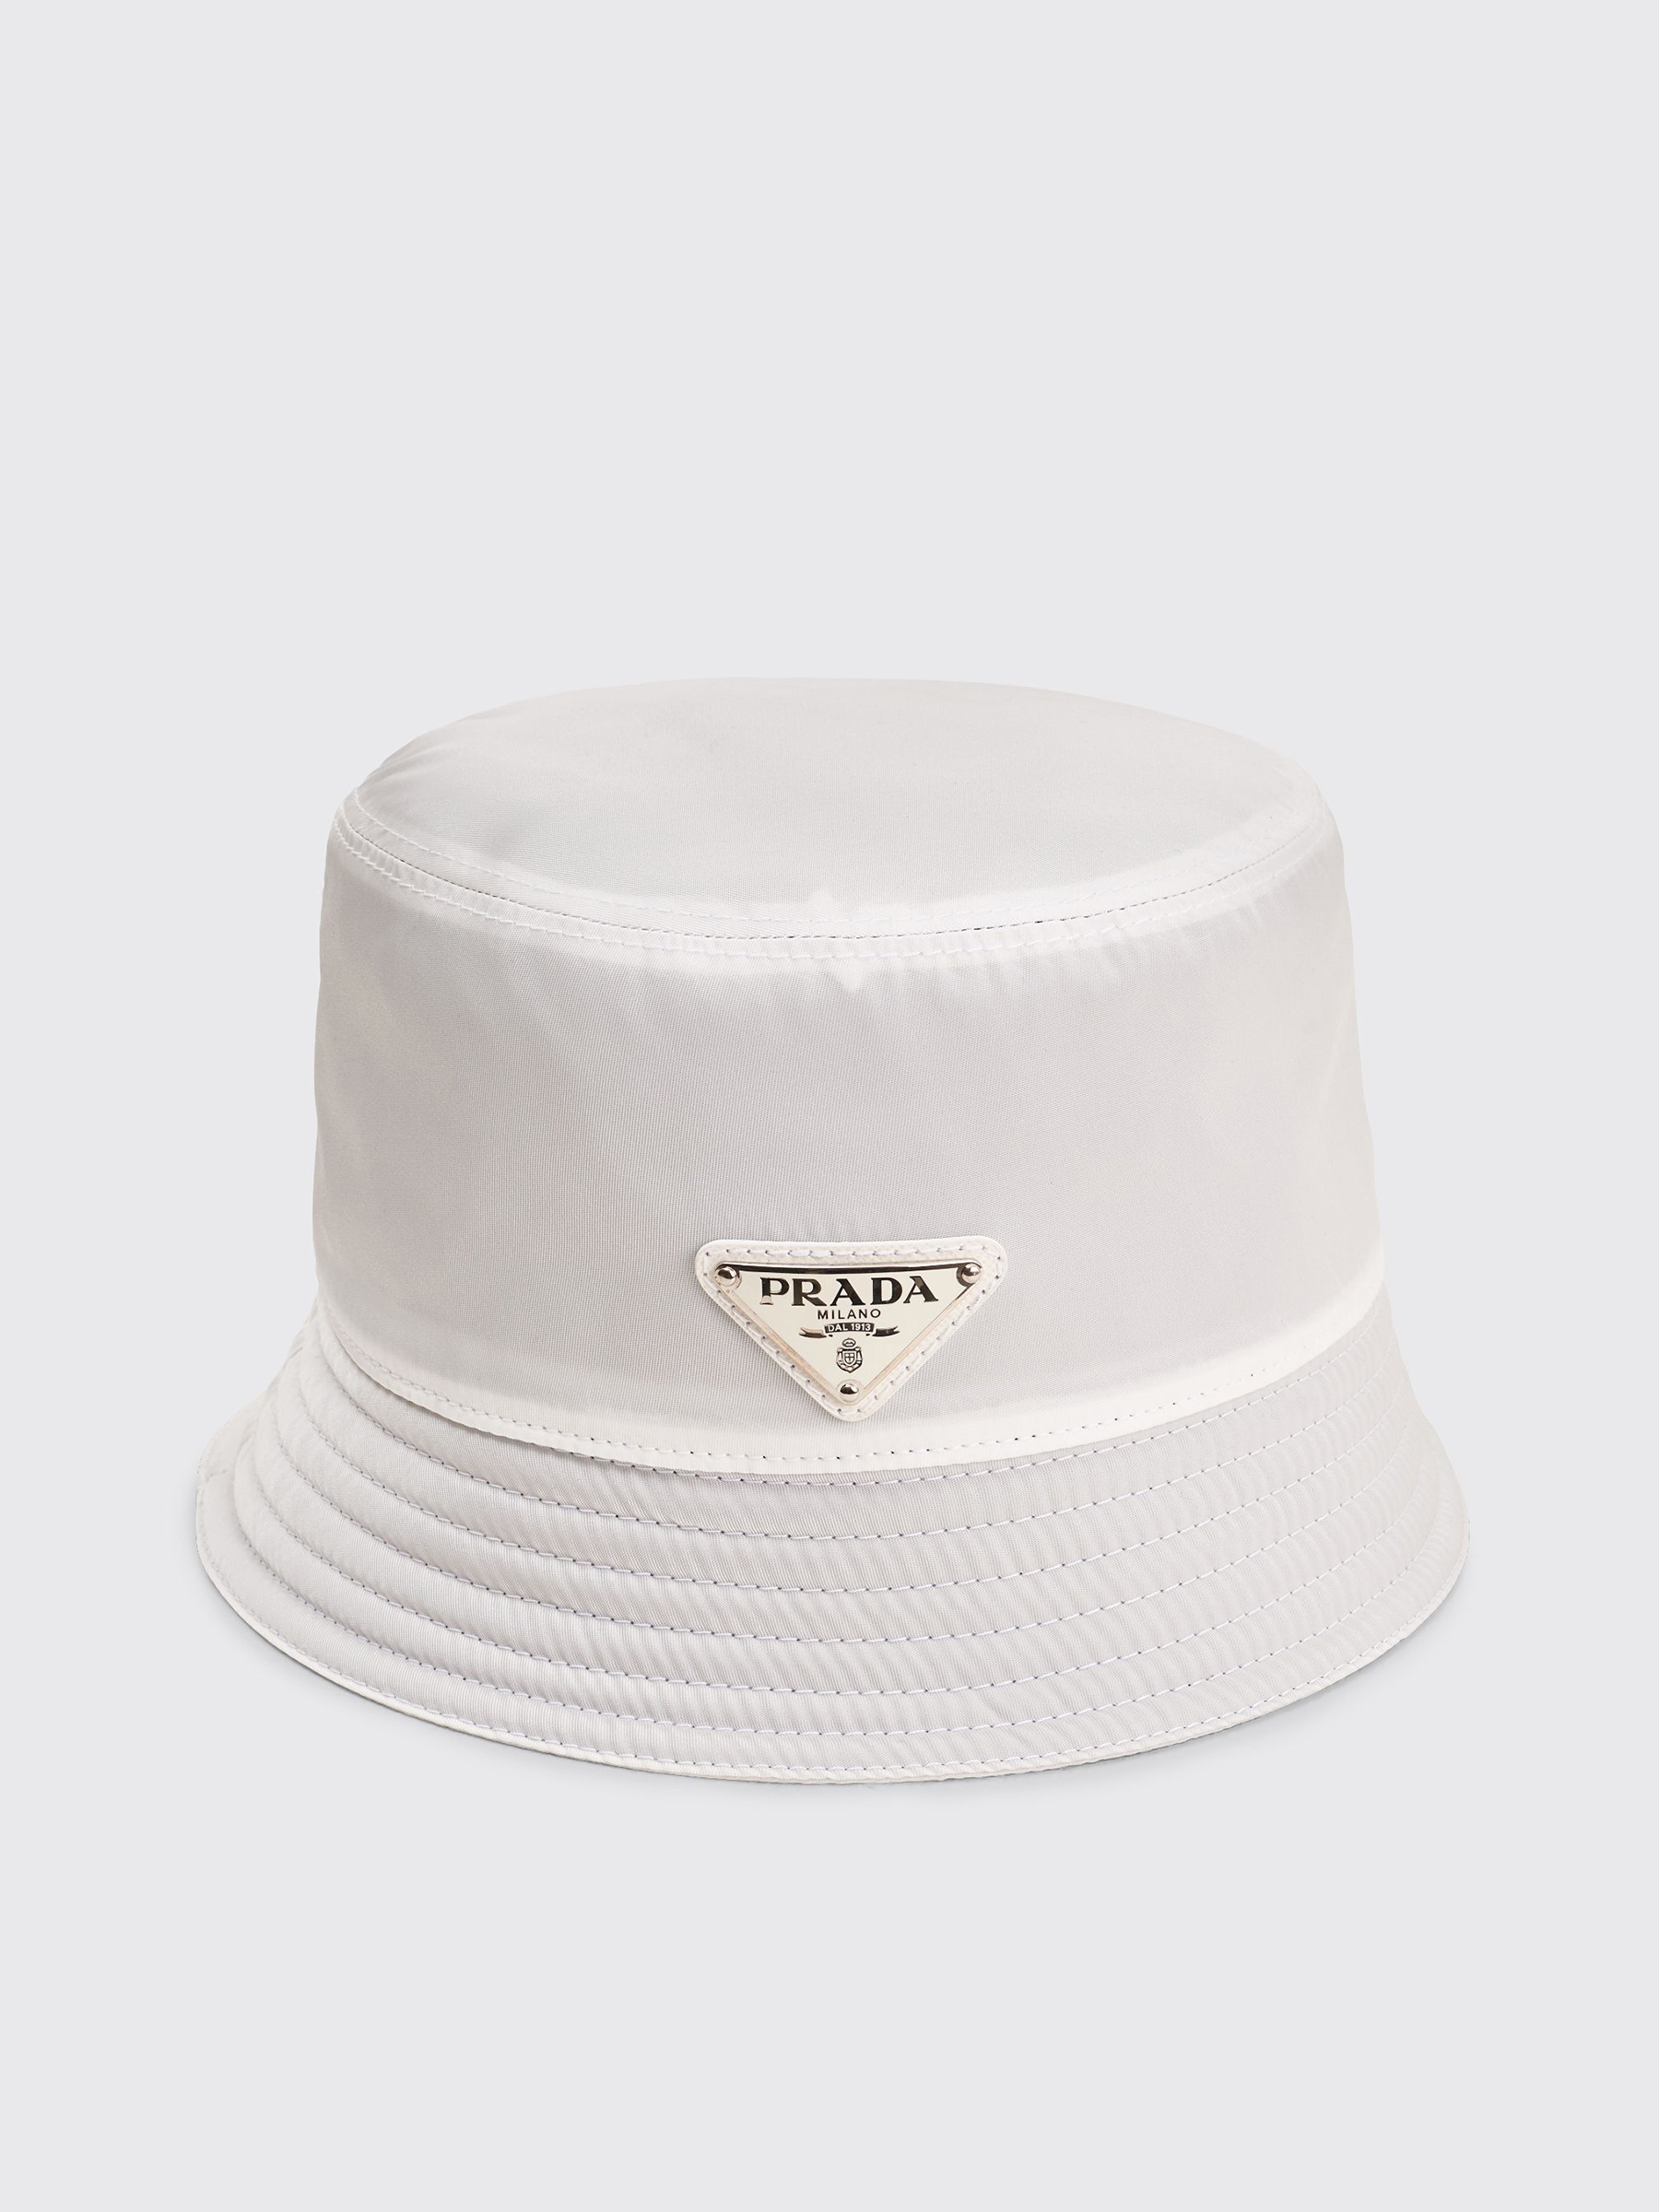 926621204aff Très Bien - Prada Nylon Bucket Hat Triangle Logo White